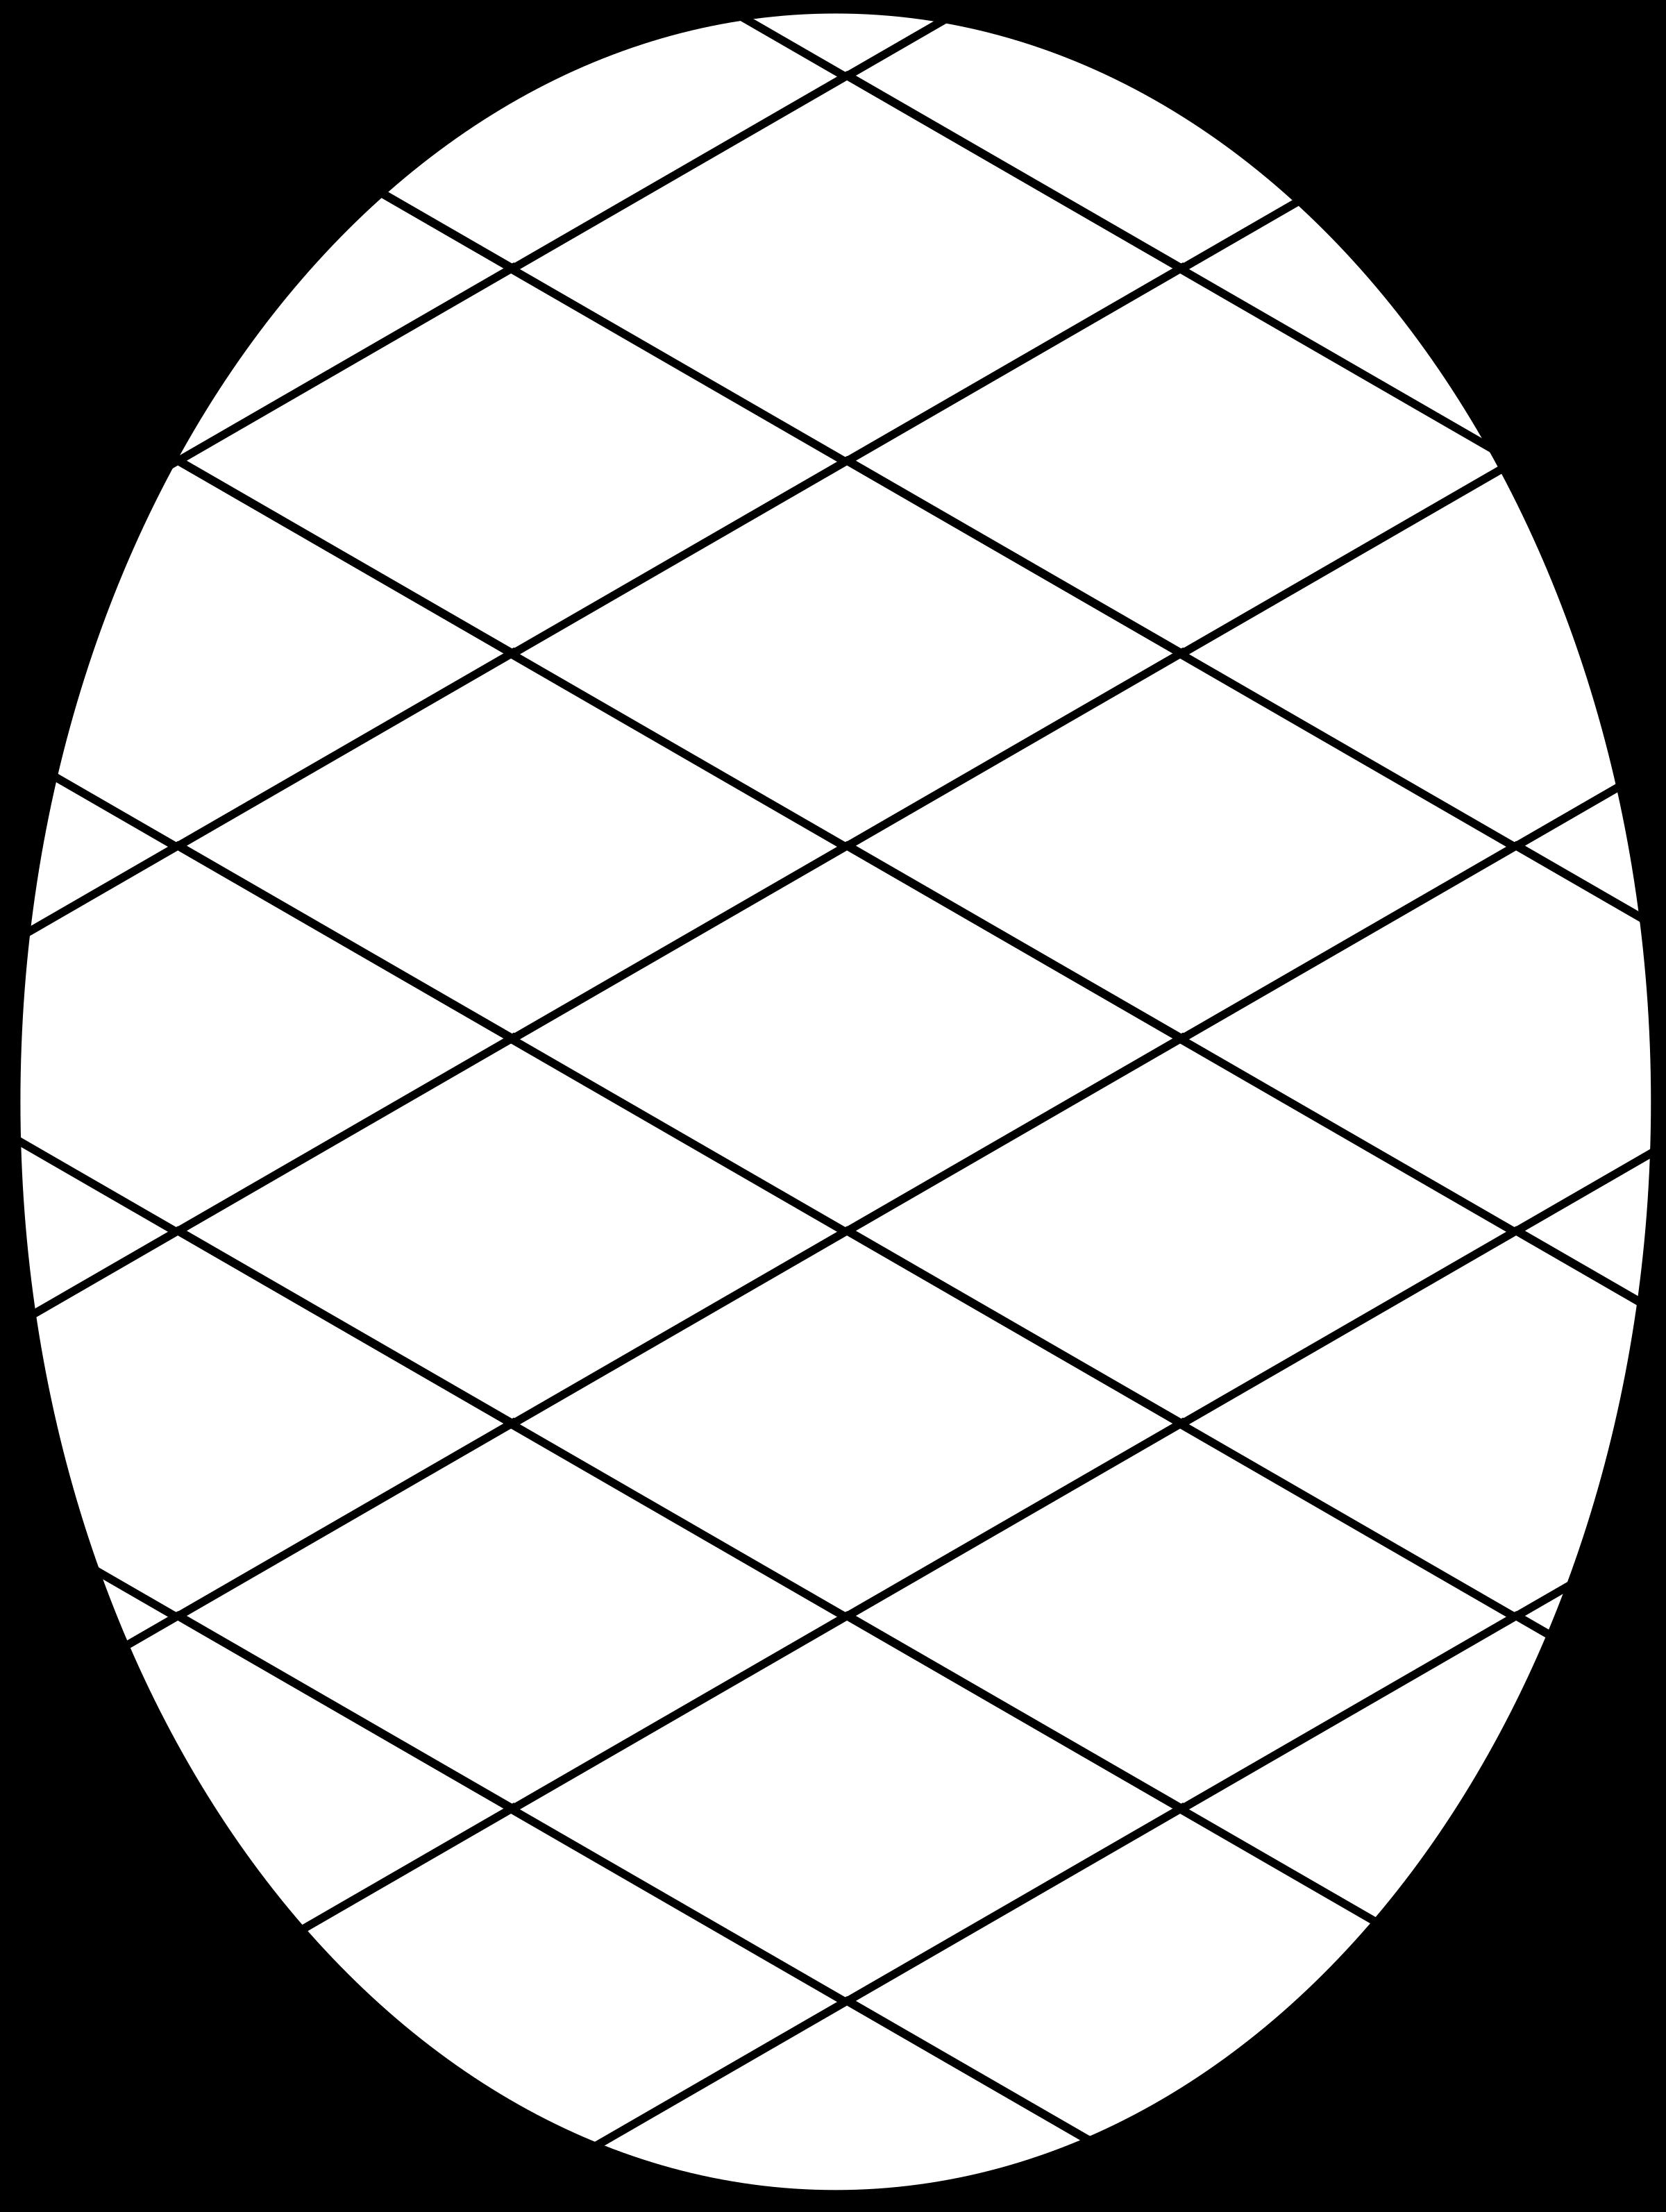 Pattern Diamond Outline